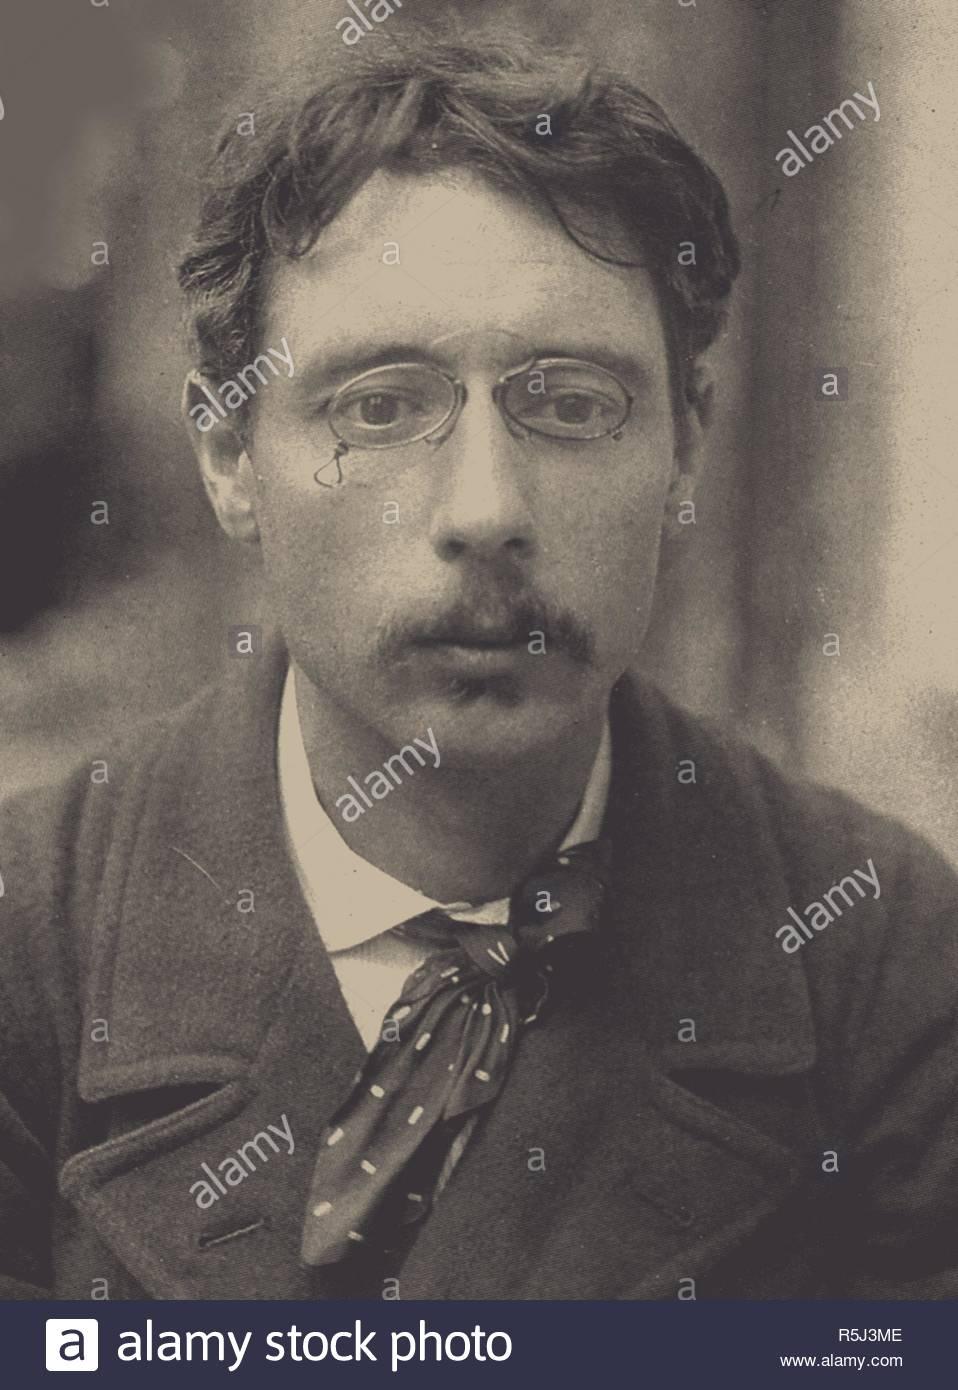 Pierre Bonnard (1867-1947). Museum: PRIVATE COLLECTION. Author: VUILLARD, EDOUARD. - Stock Image